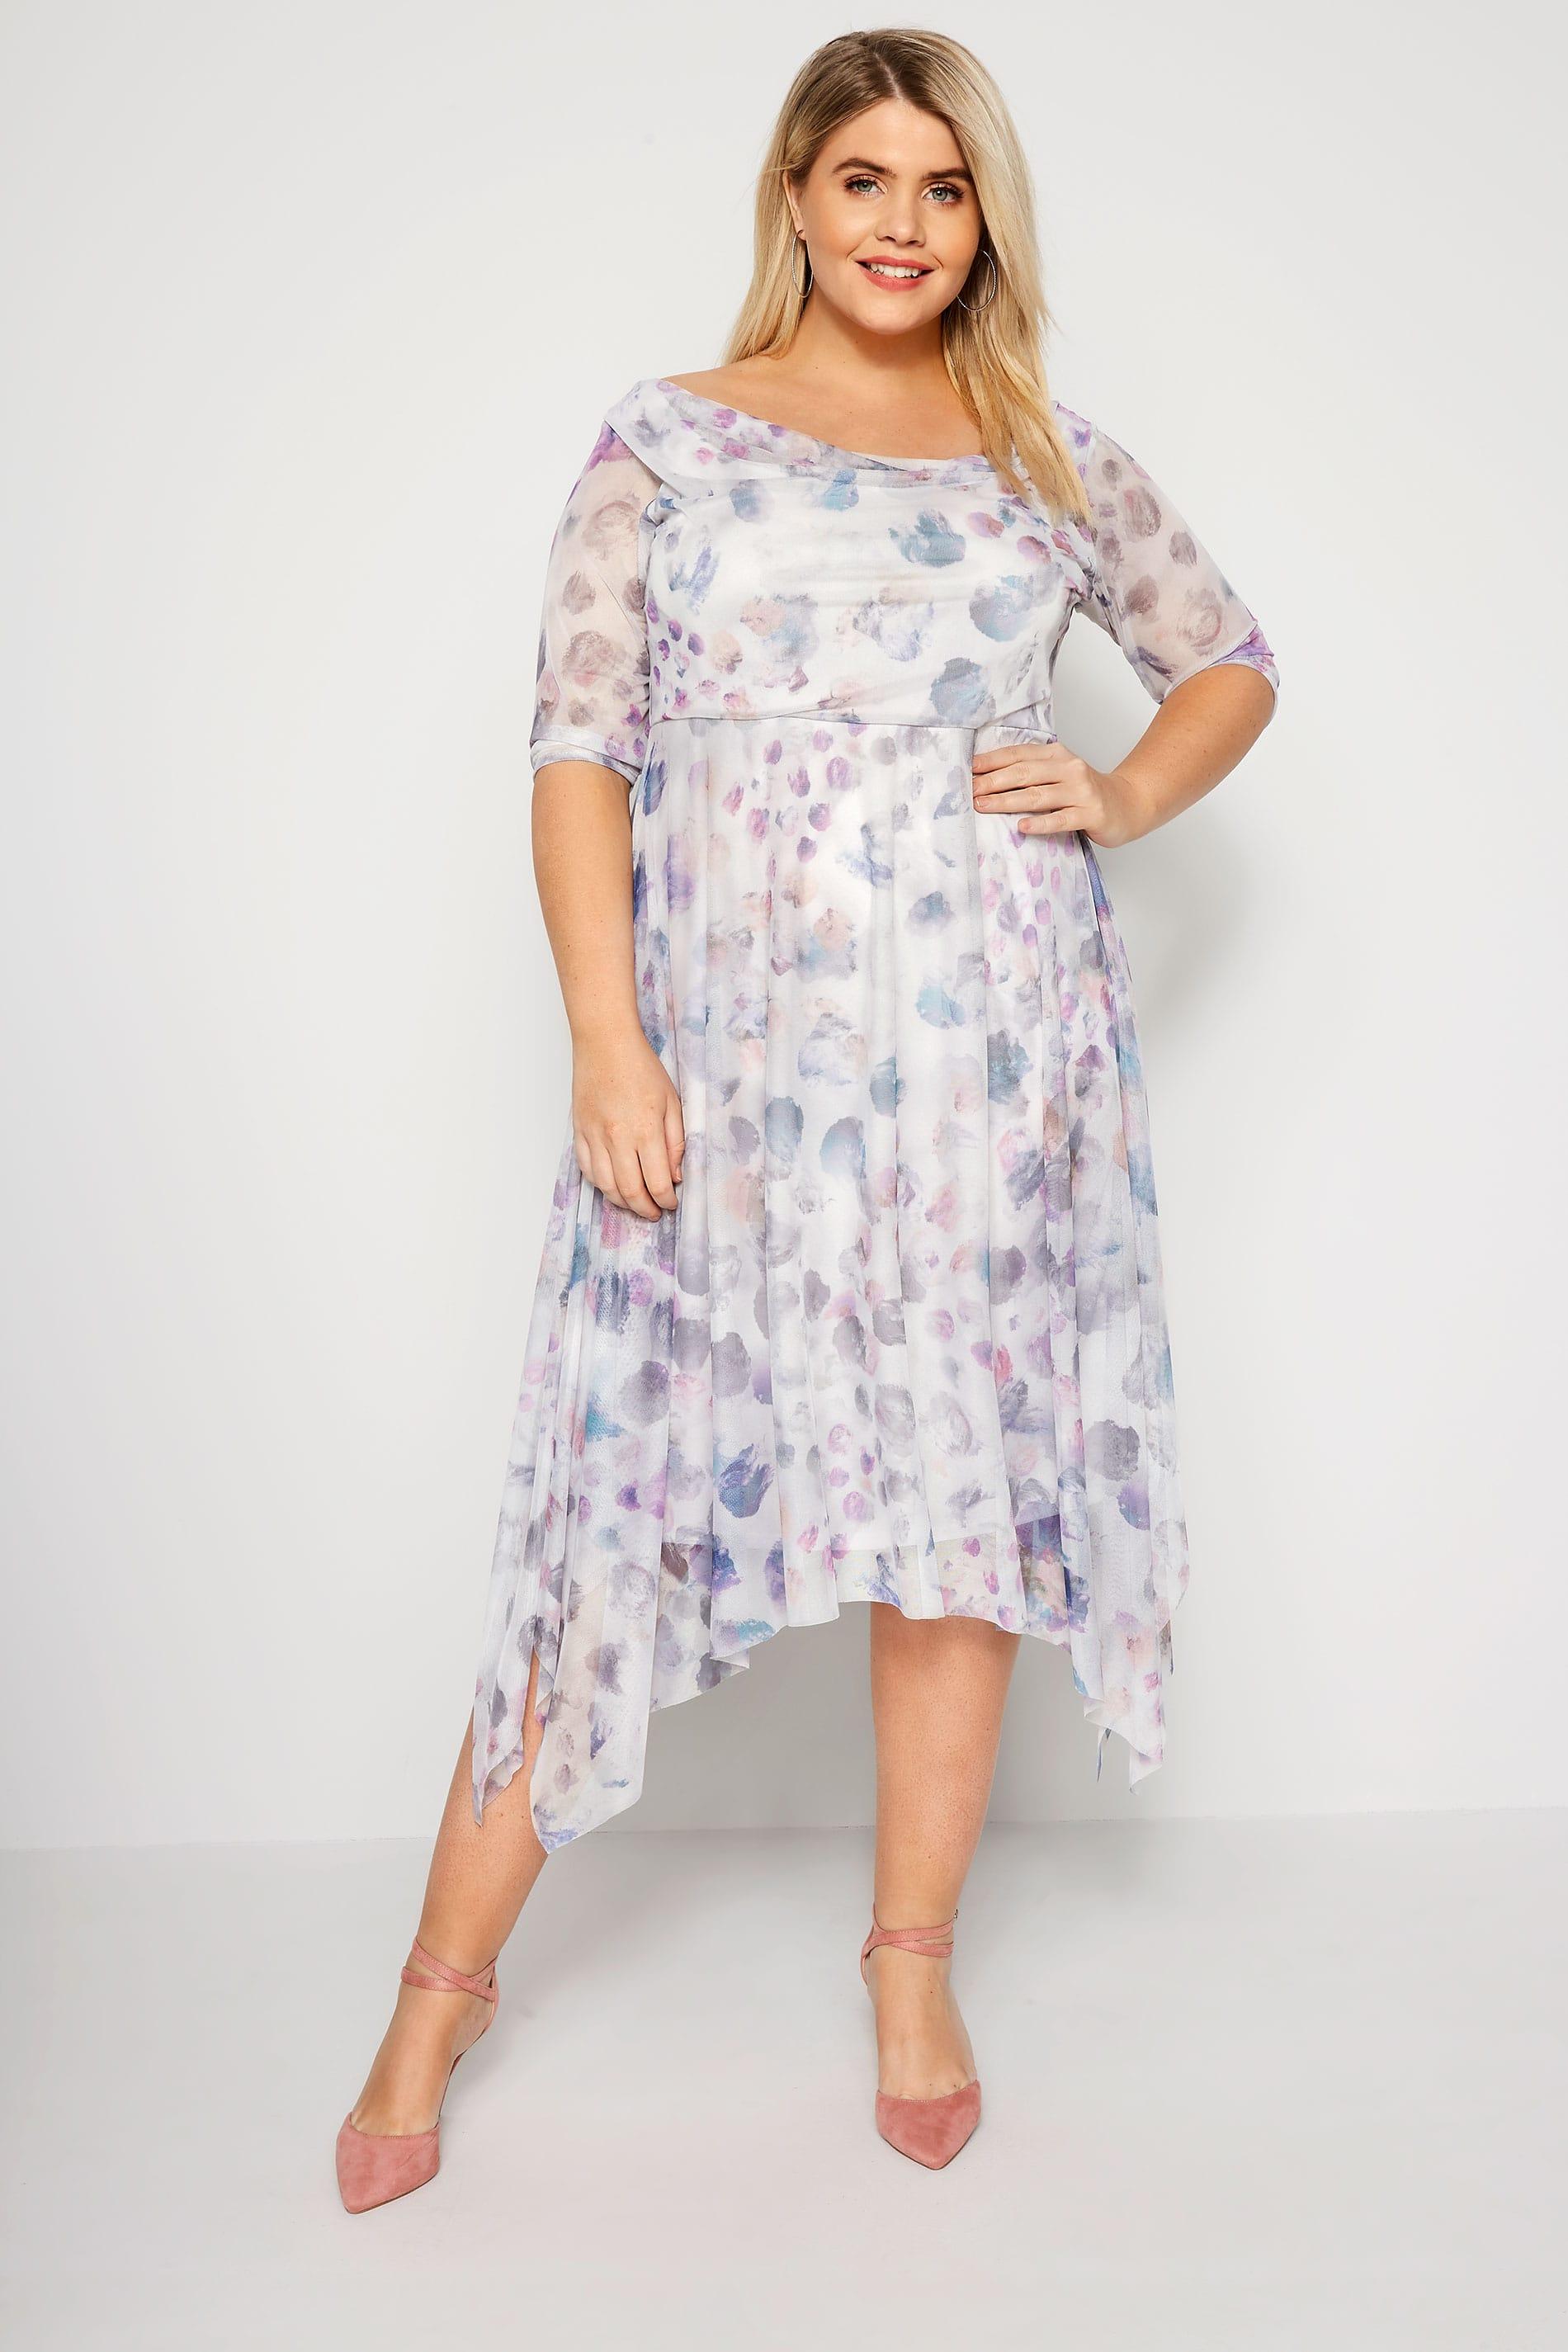 YOURS LONDON White & Dusky Grey Spot Midi Dress With Cowl Neck